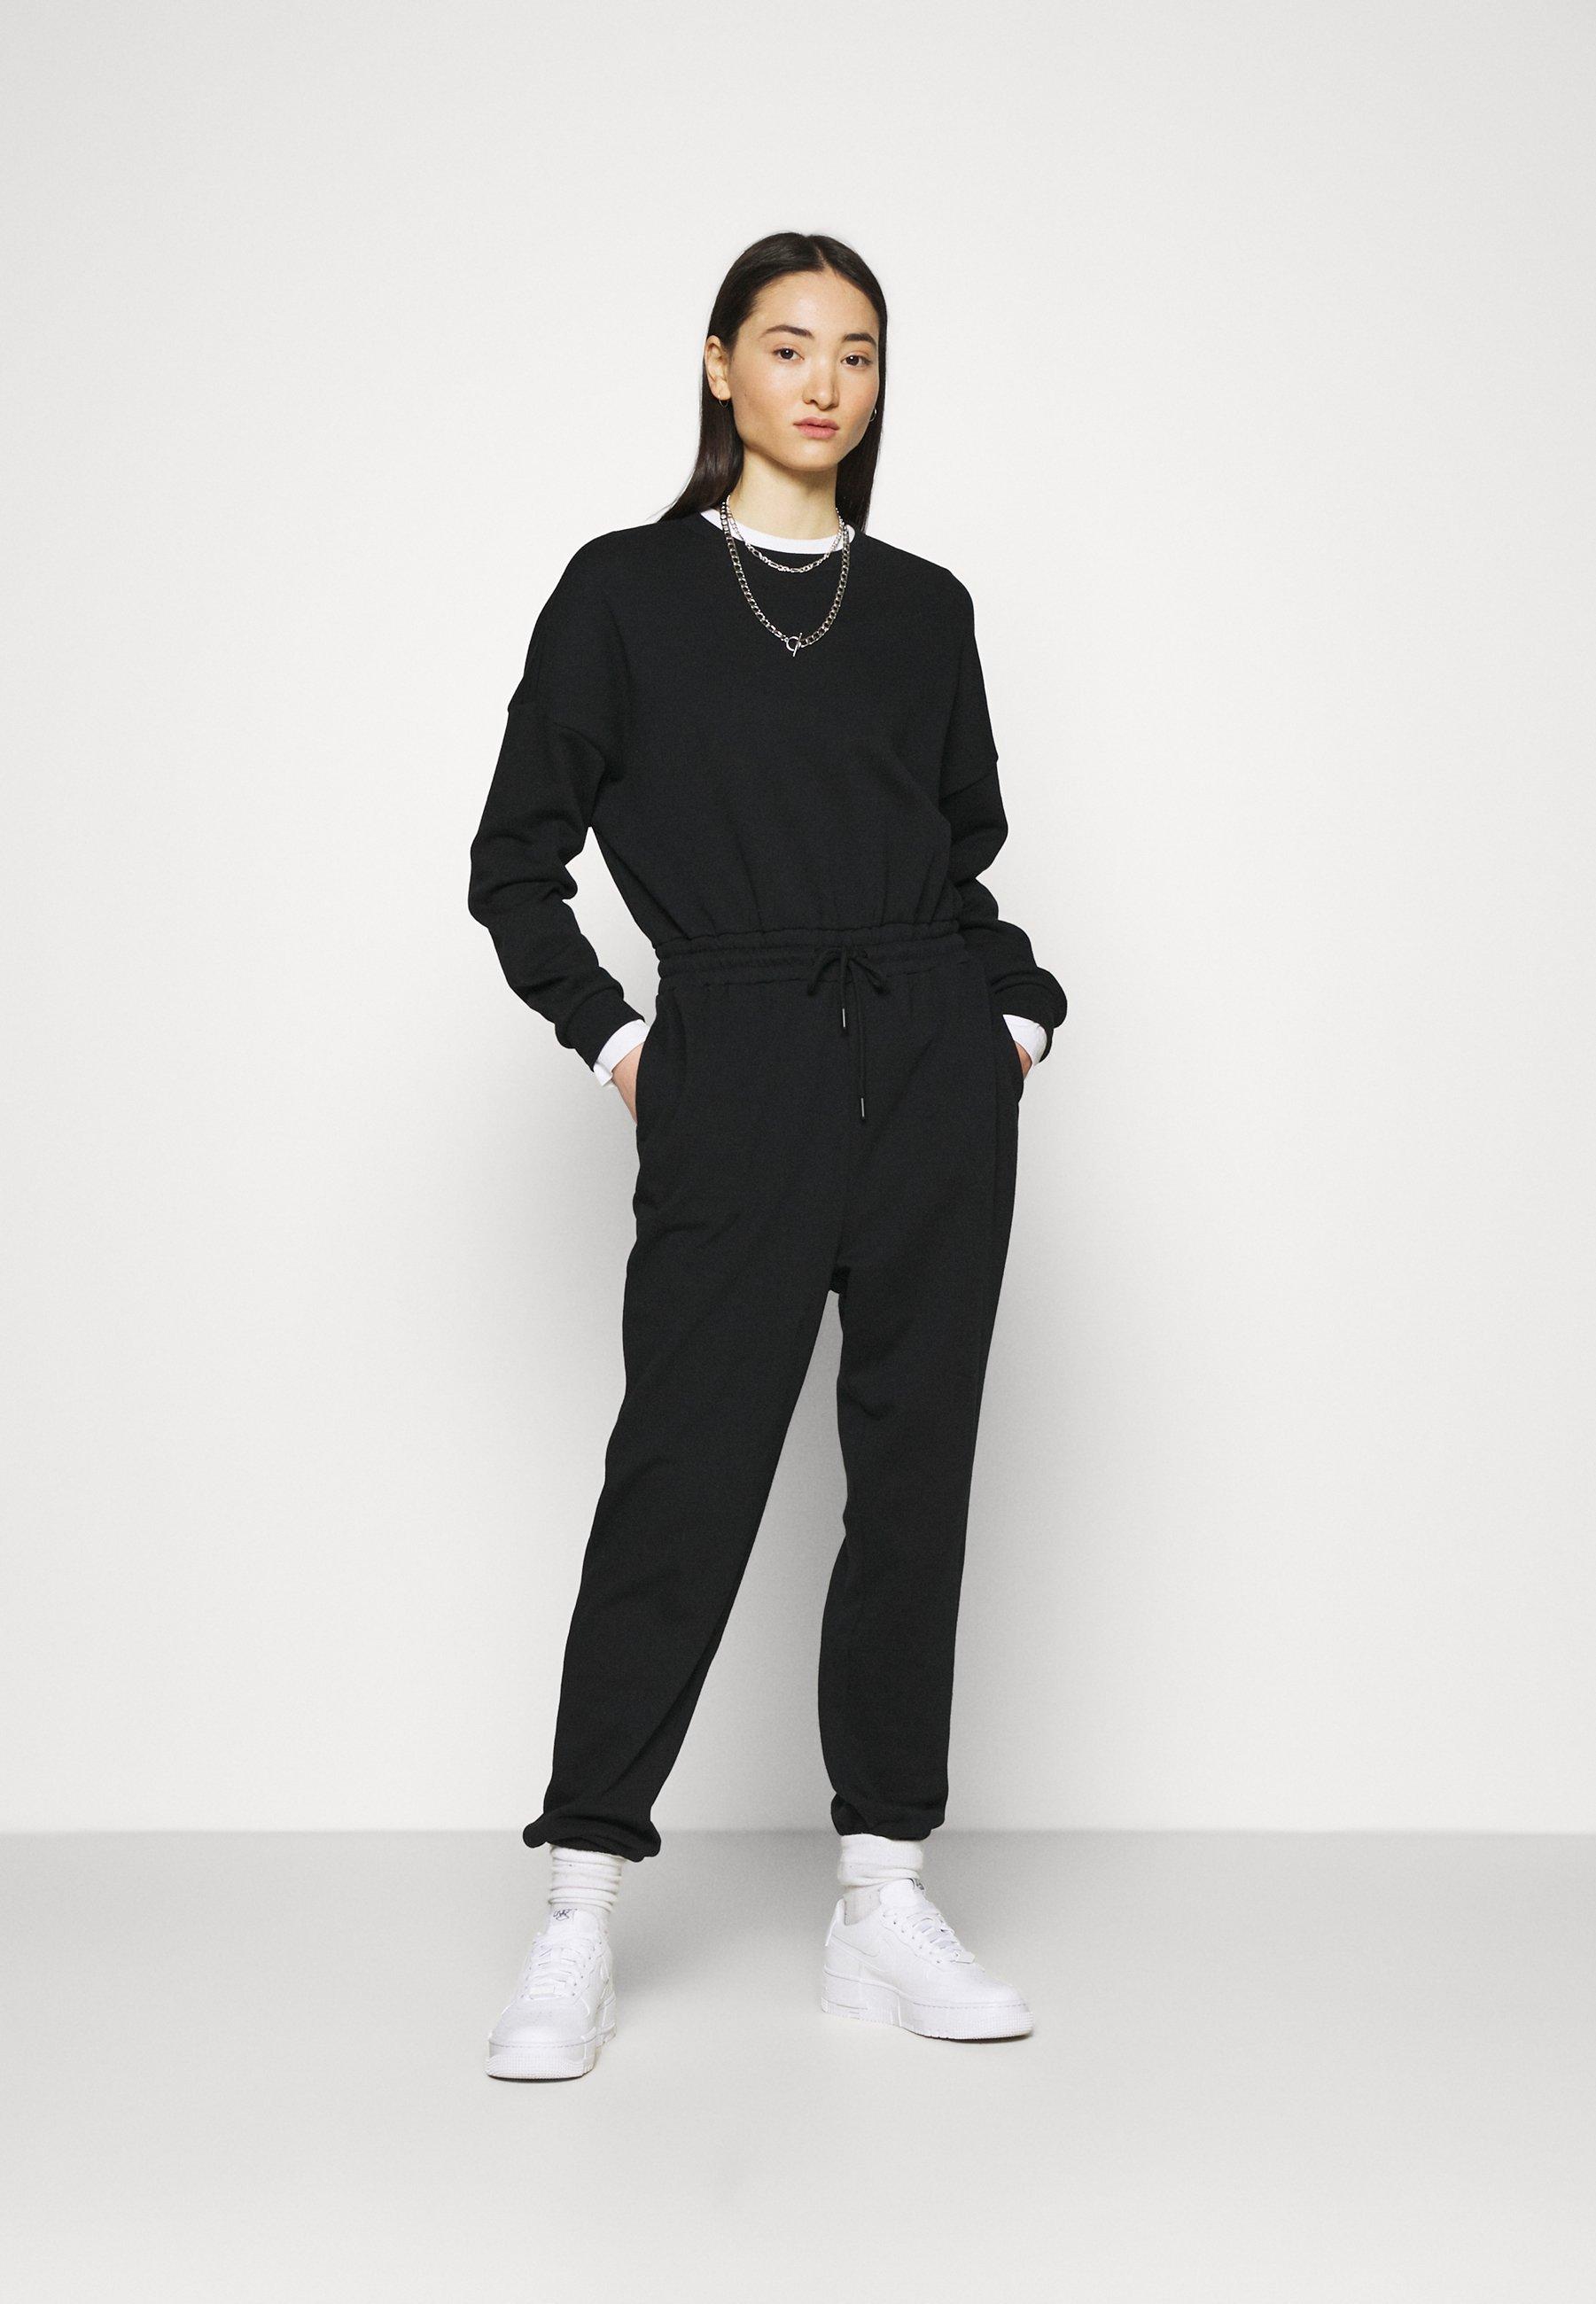 Women SWEAT - Oversized comfy - Jumpsuit